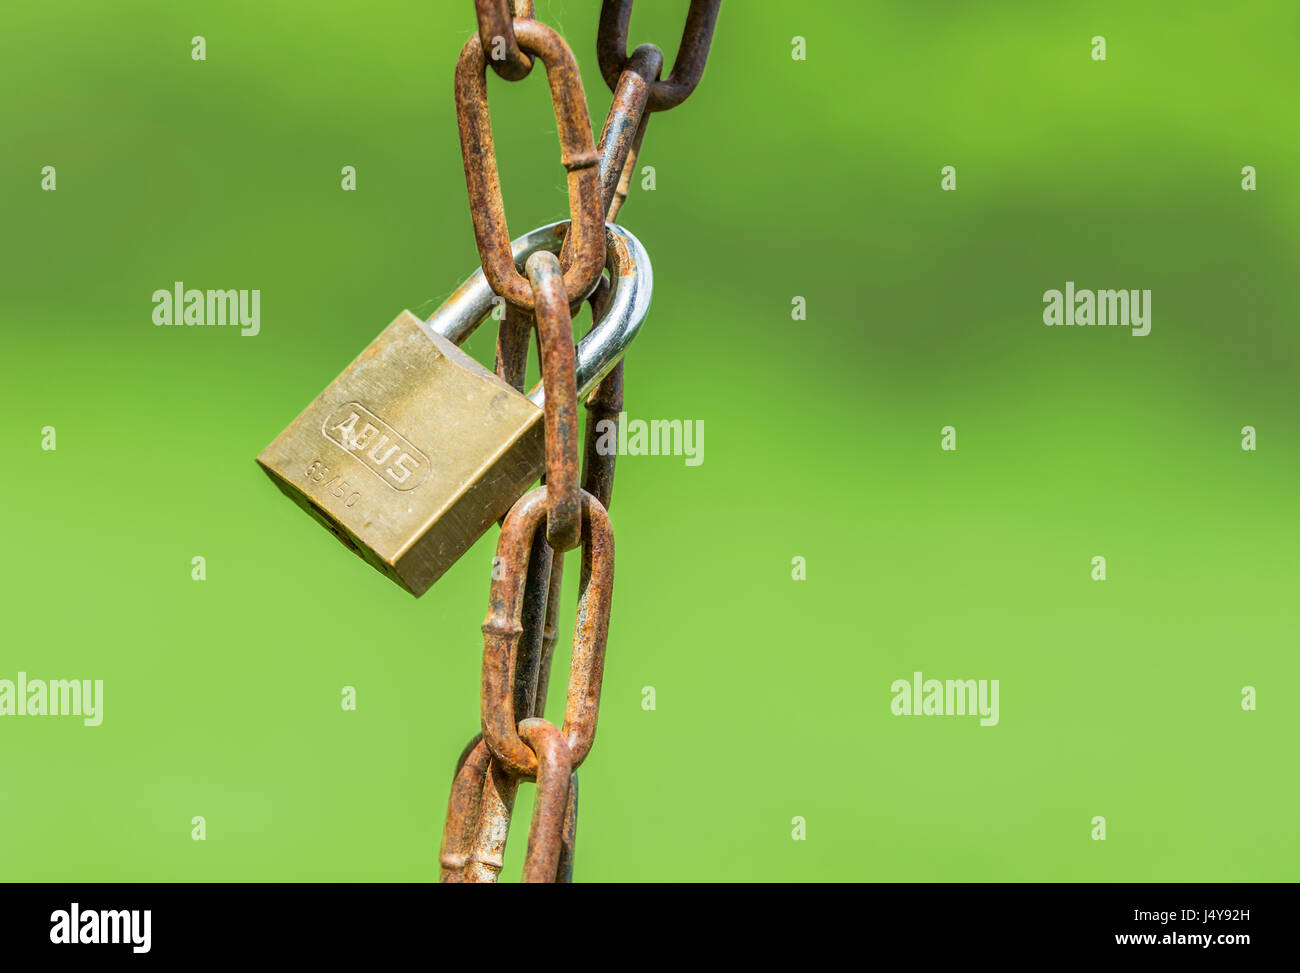 locked-concept-locked-padlock-around-a-r